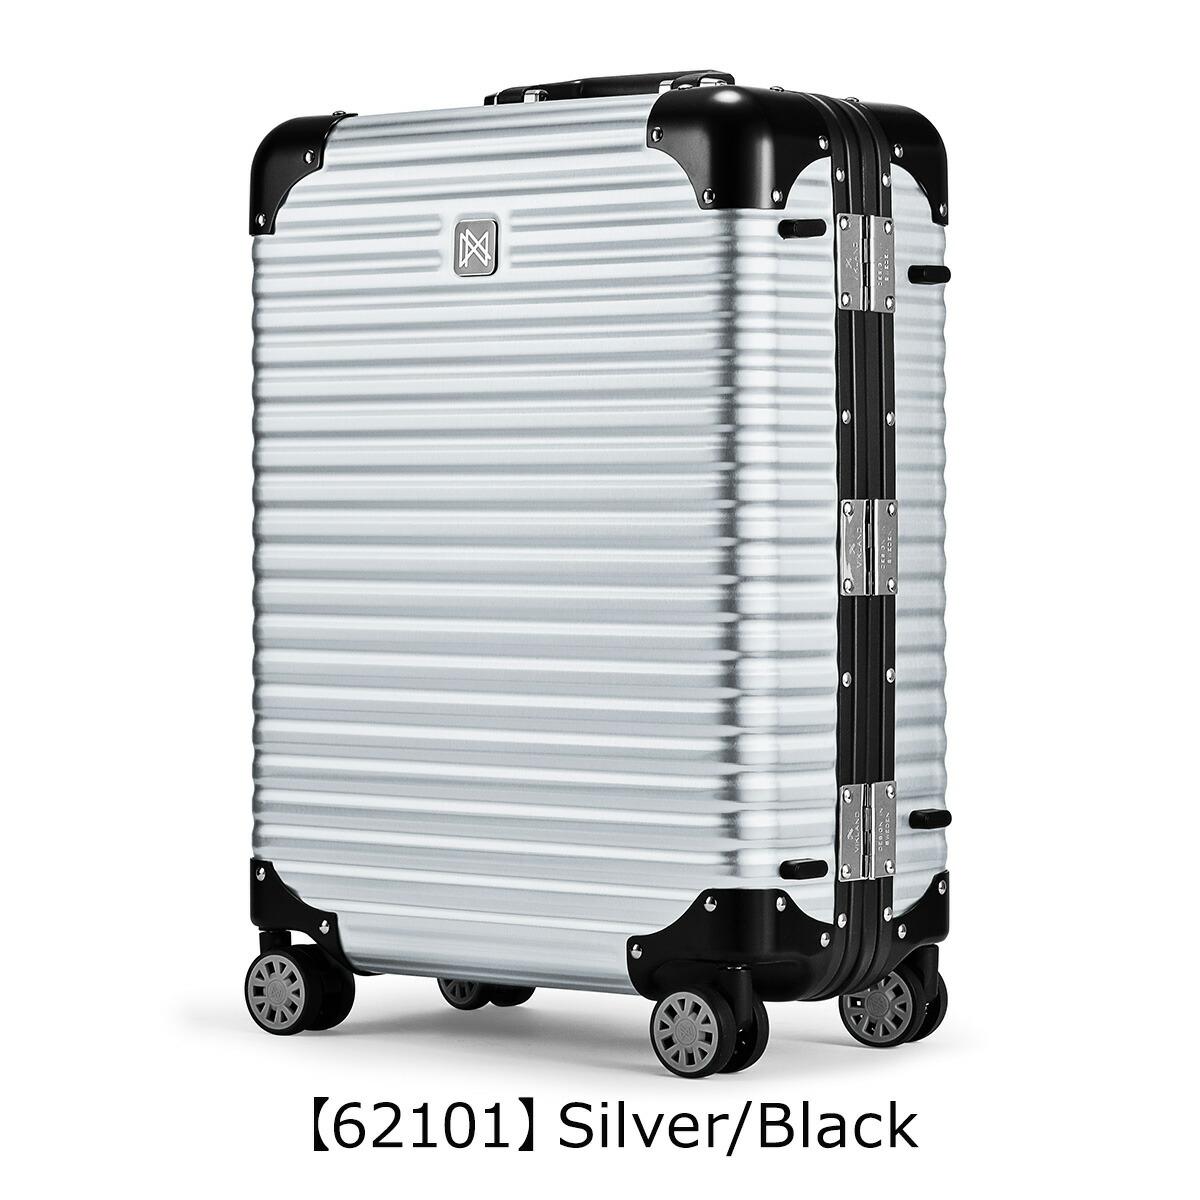 【62101】Silver/Black